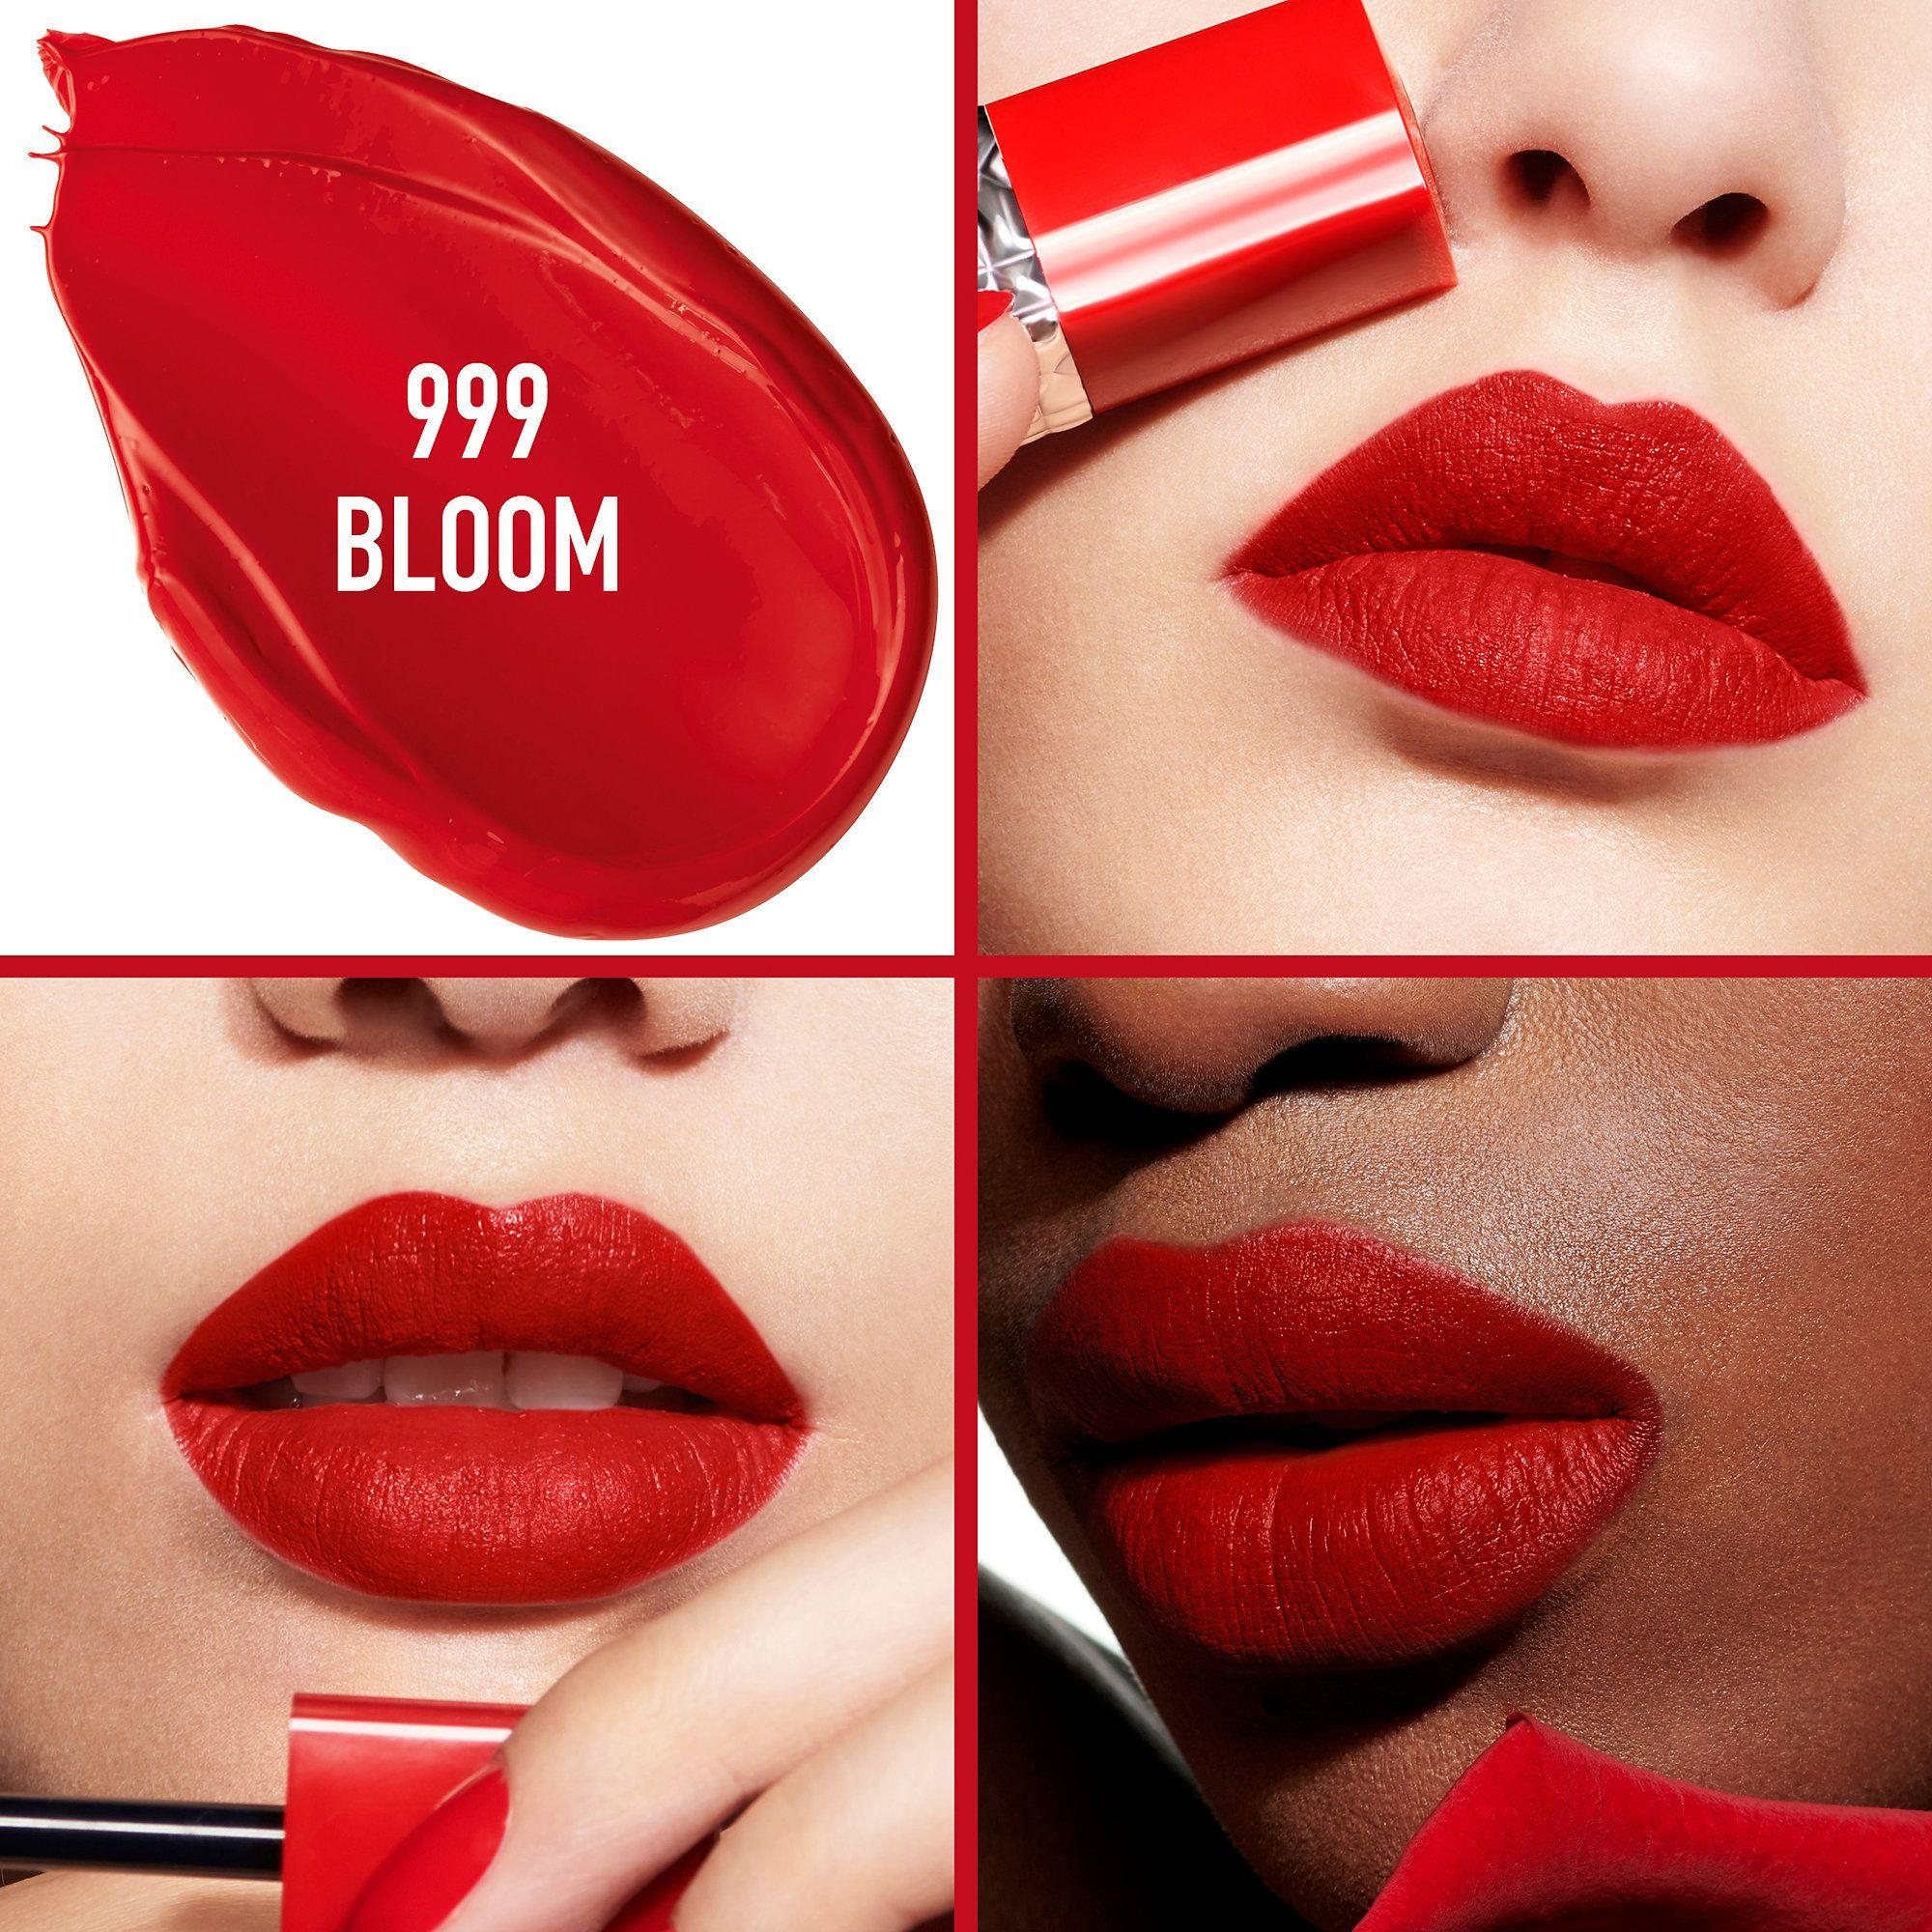 Rouge Dior Ultra Care Liquid Lipstick Dior Sephora In 2020 Red Liquid Lipstick Lipstick Liquid Lipstick